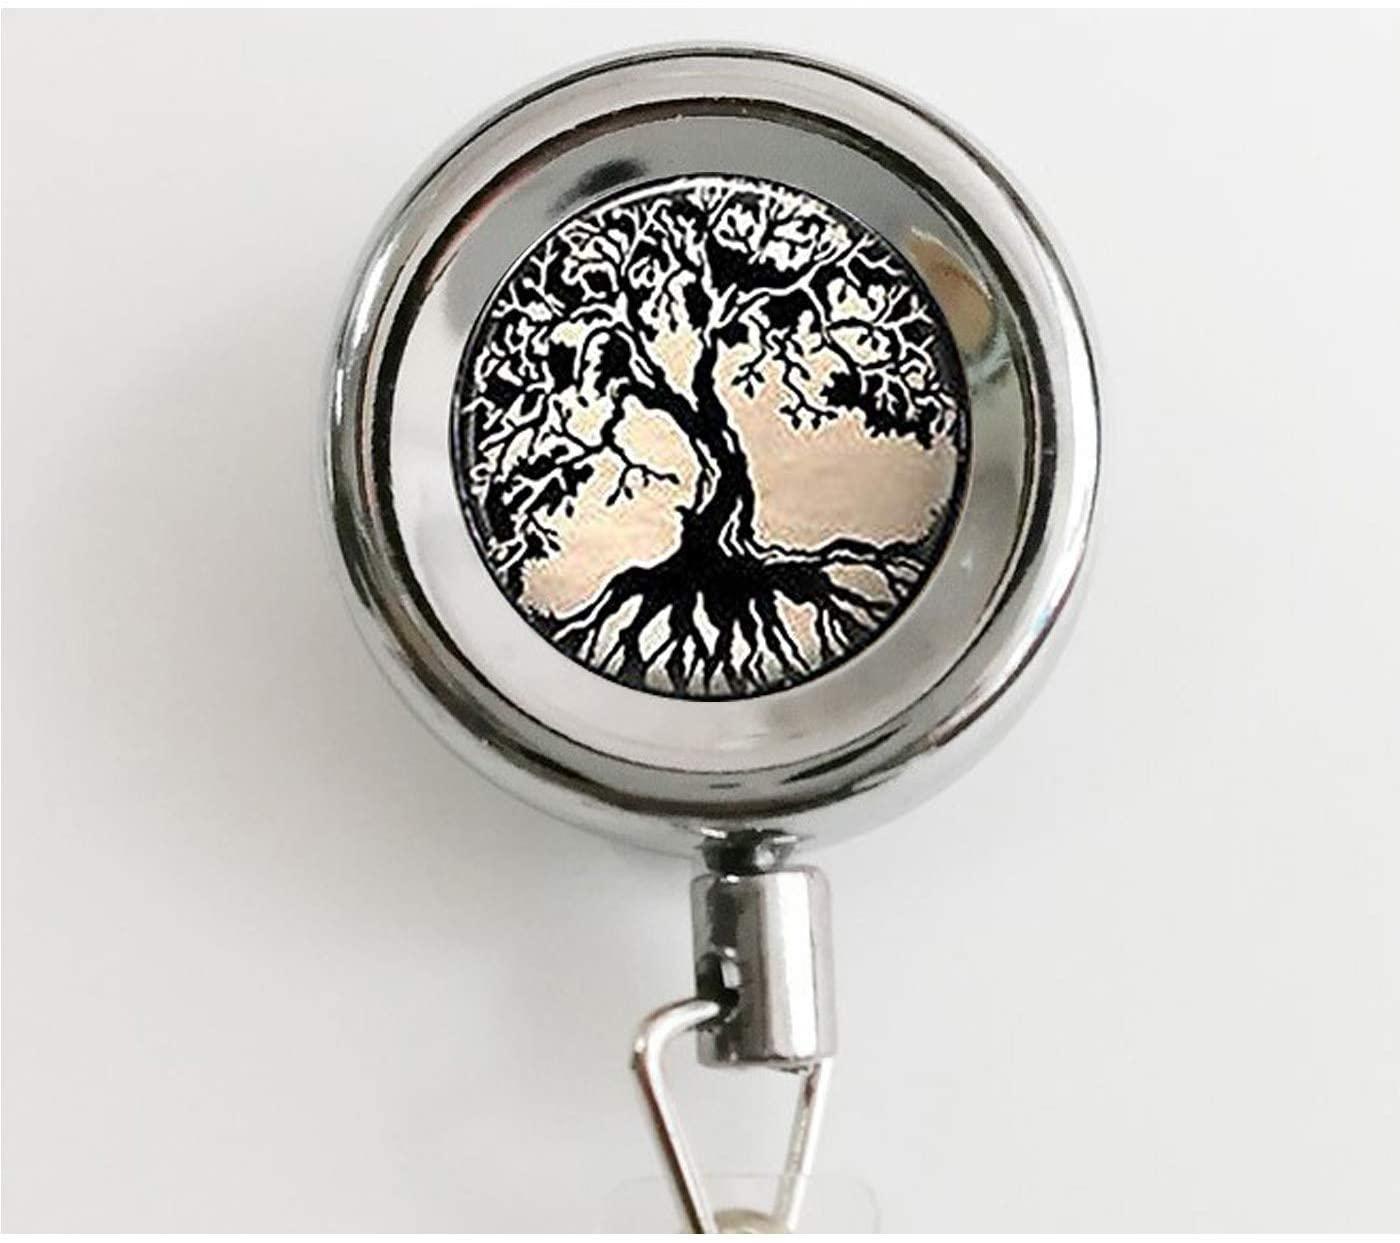 Glass Tile Keychain,Tree Keychain,Tree of Life Glass Tile Keychain_ Retractable Badge Reel with Waterproof ID Holders & Keychain